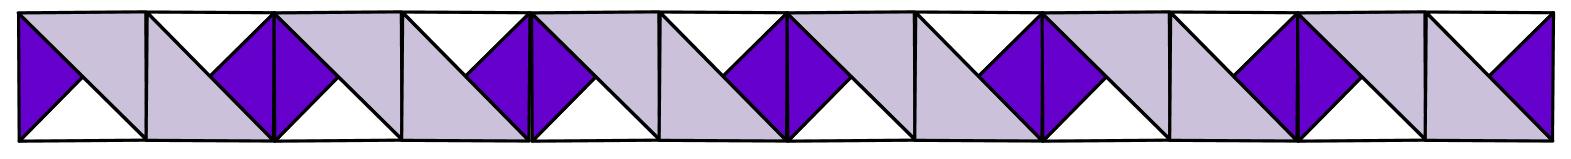 Diagram 3 Rainbow Ribbons Quilt